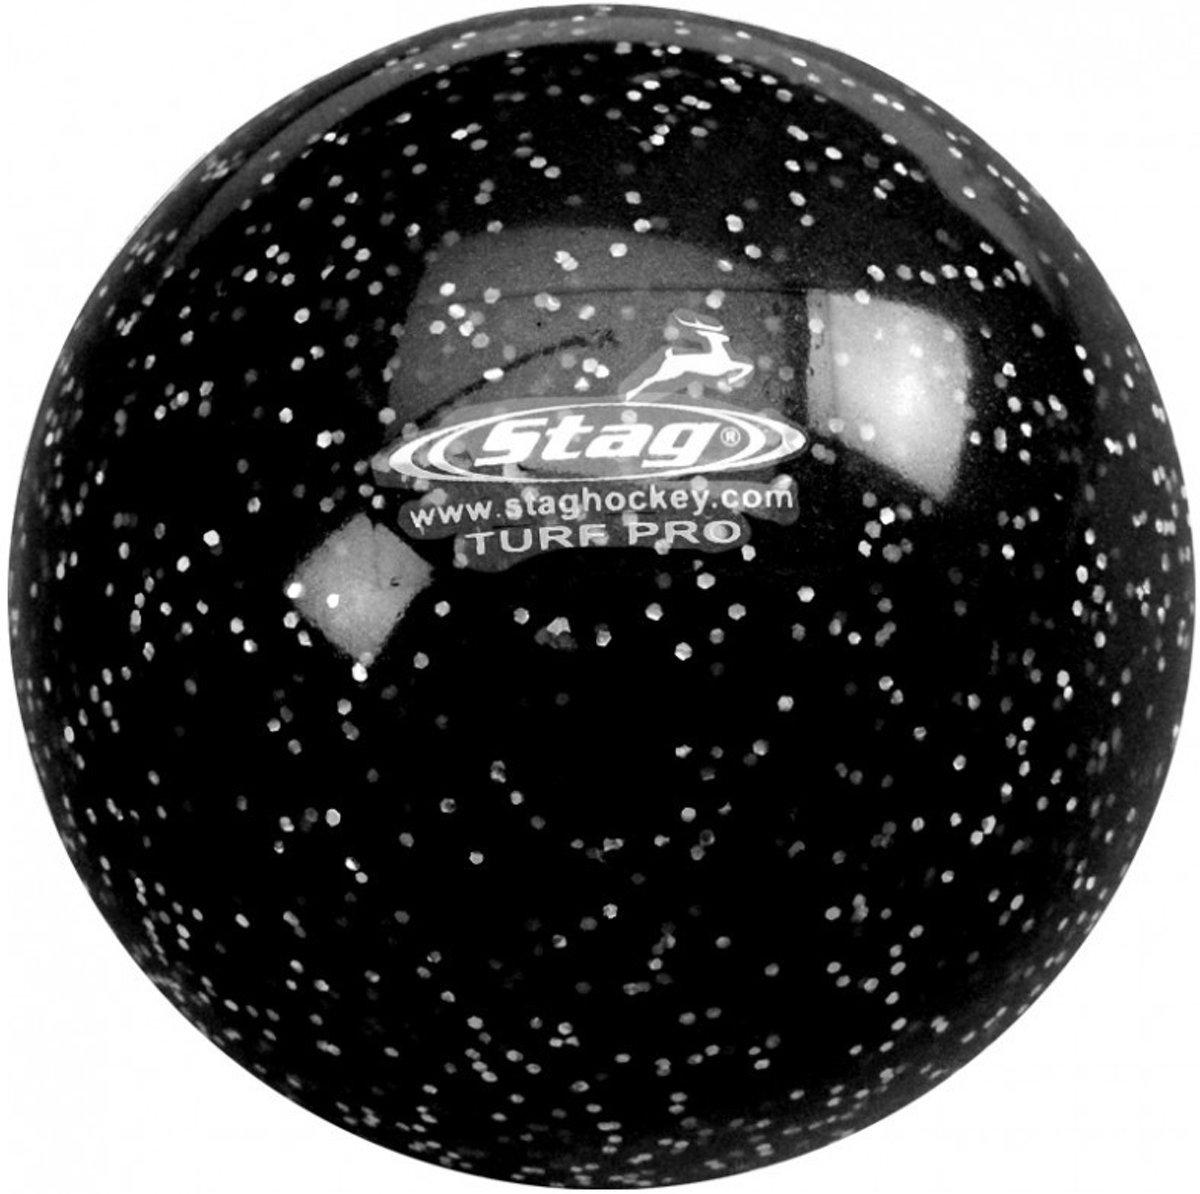 Stag Glitter ball - Veldhockeybal - Zwart kopen